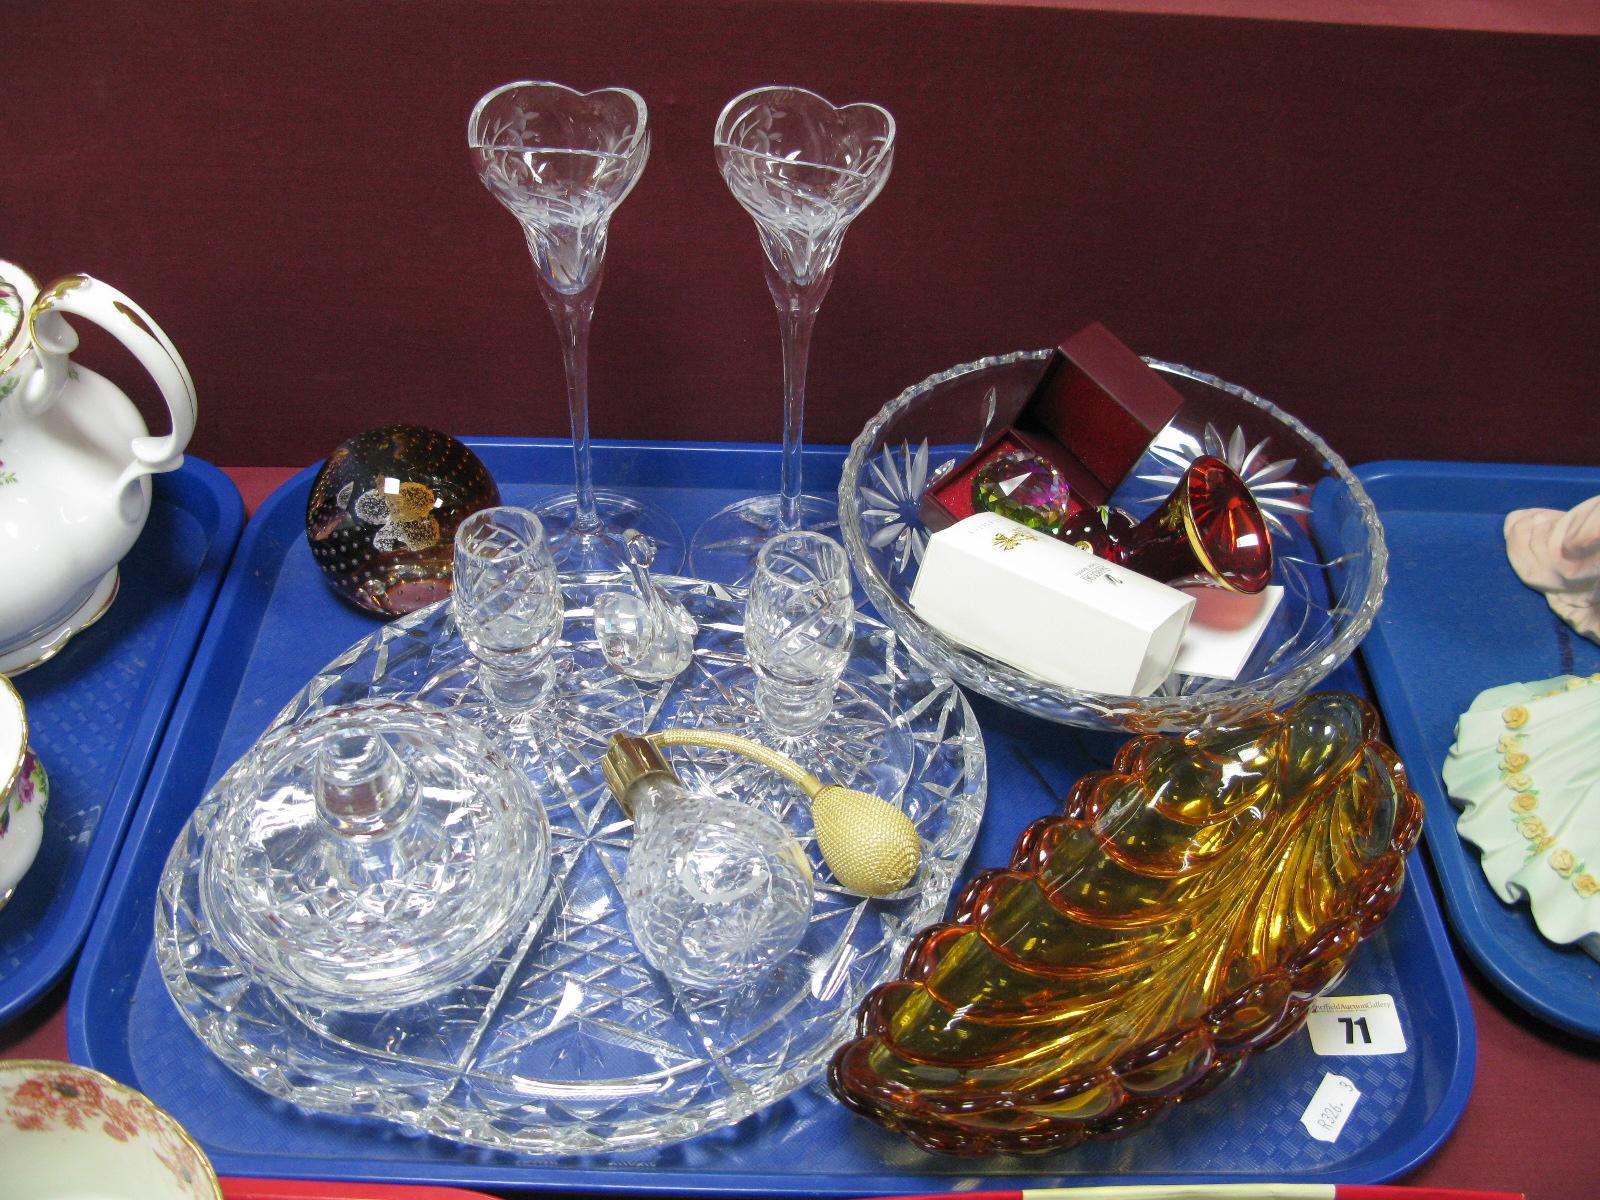 Lot 71 - Swarovski - Crystal Figures, Edinburgh tray, Brierley trinkets, Caithness paperweight etc:- One